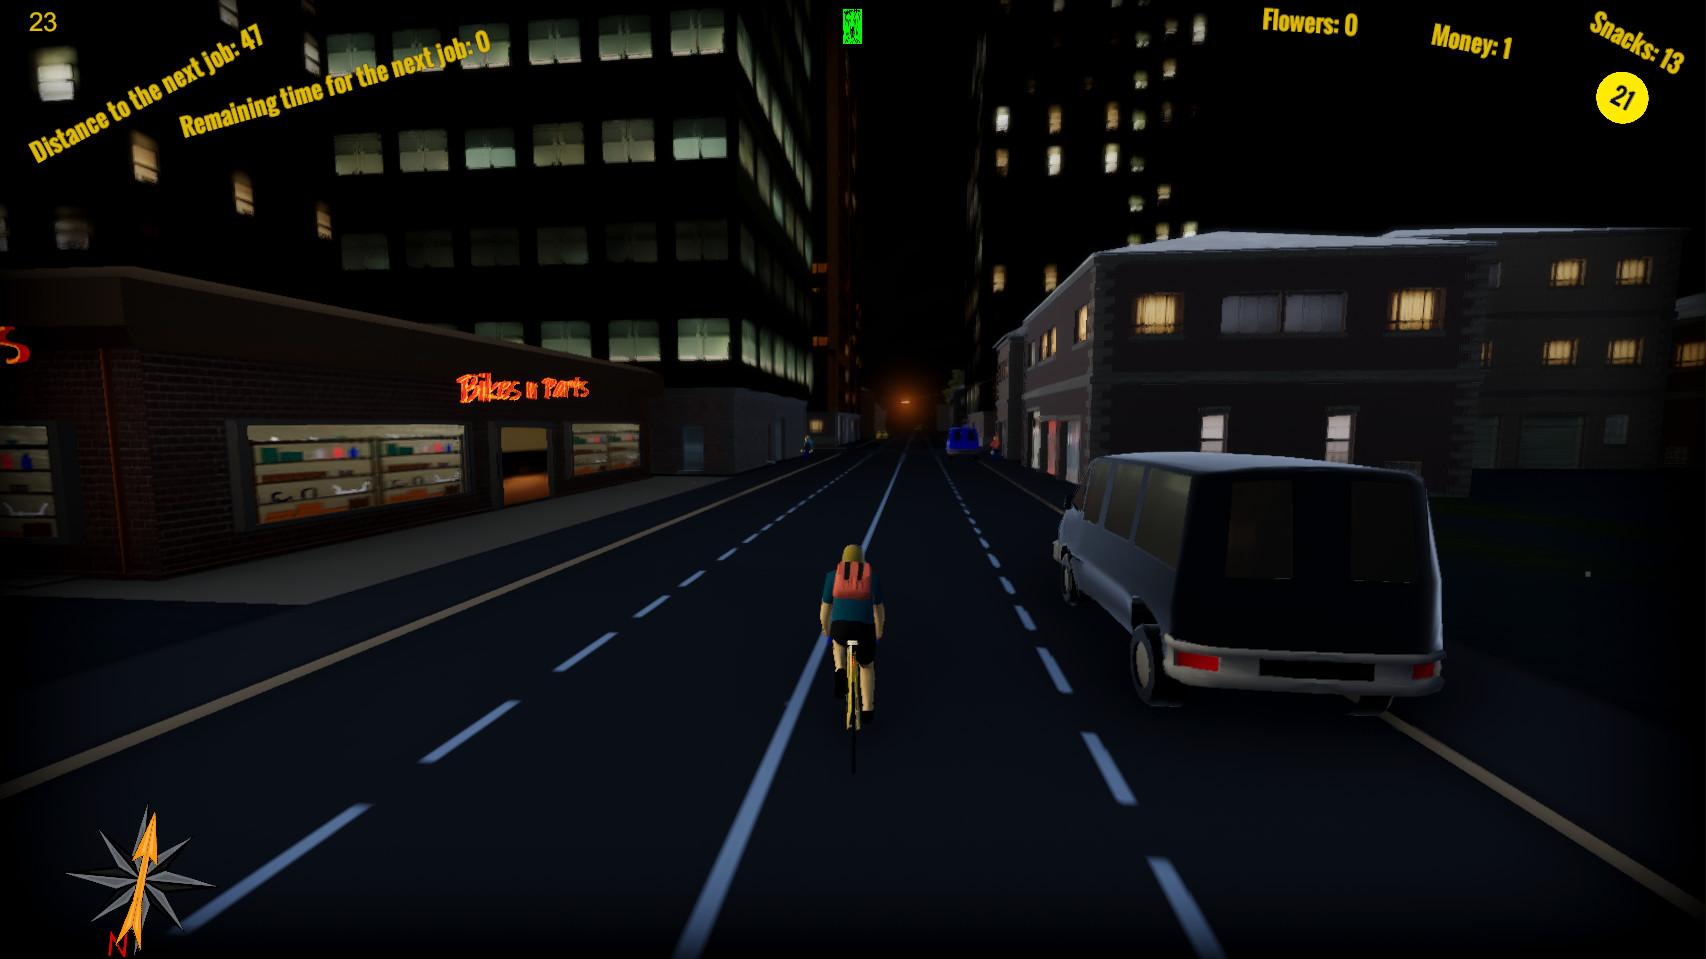 b m g 19 - bike messenger go!